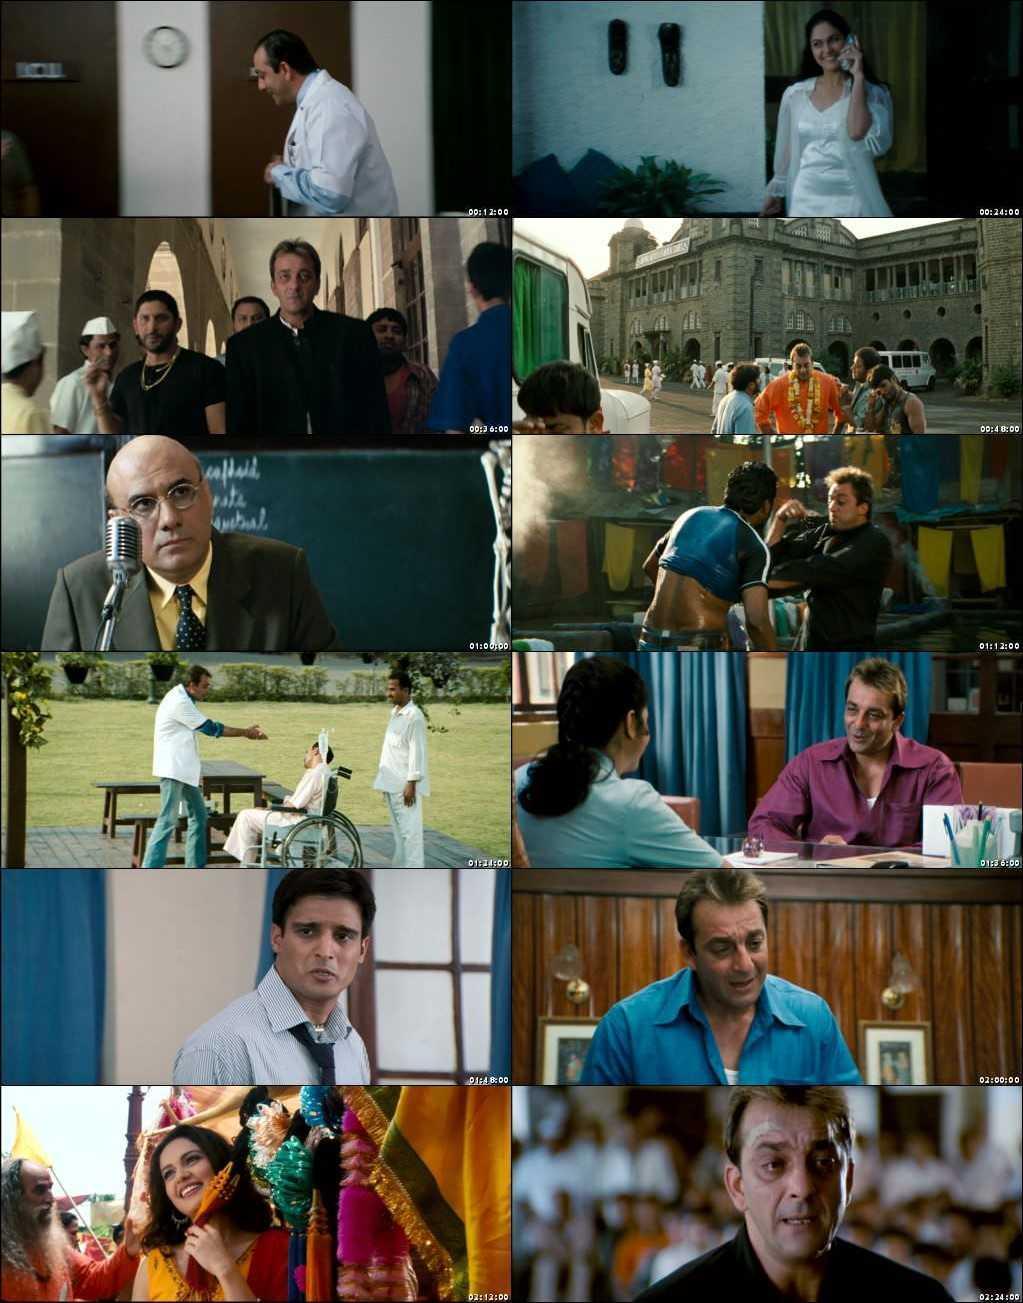 Munna Bhai M.B.B.S 2003 Screenshot 1080p